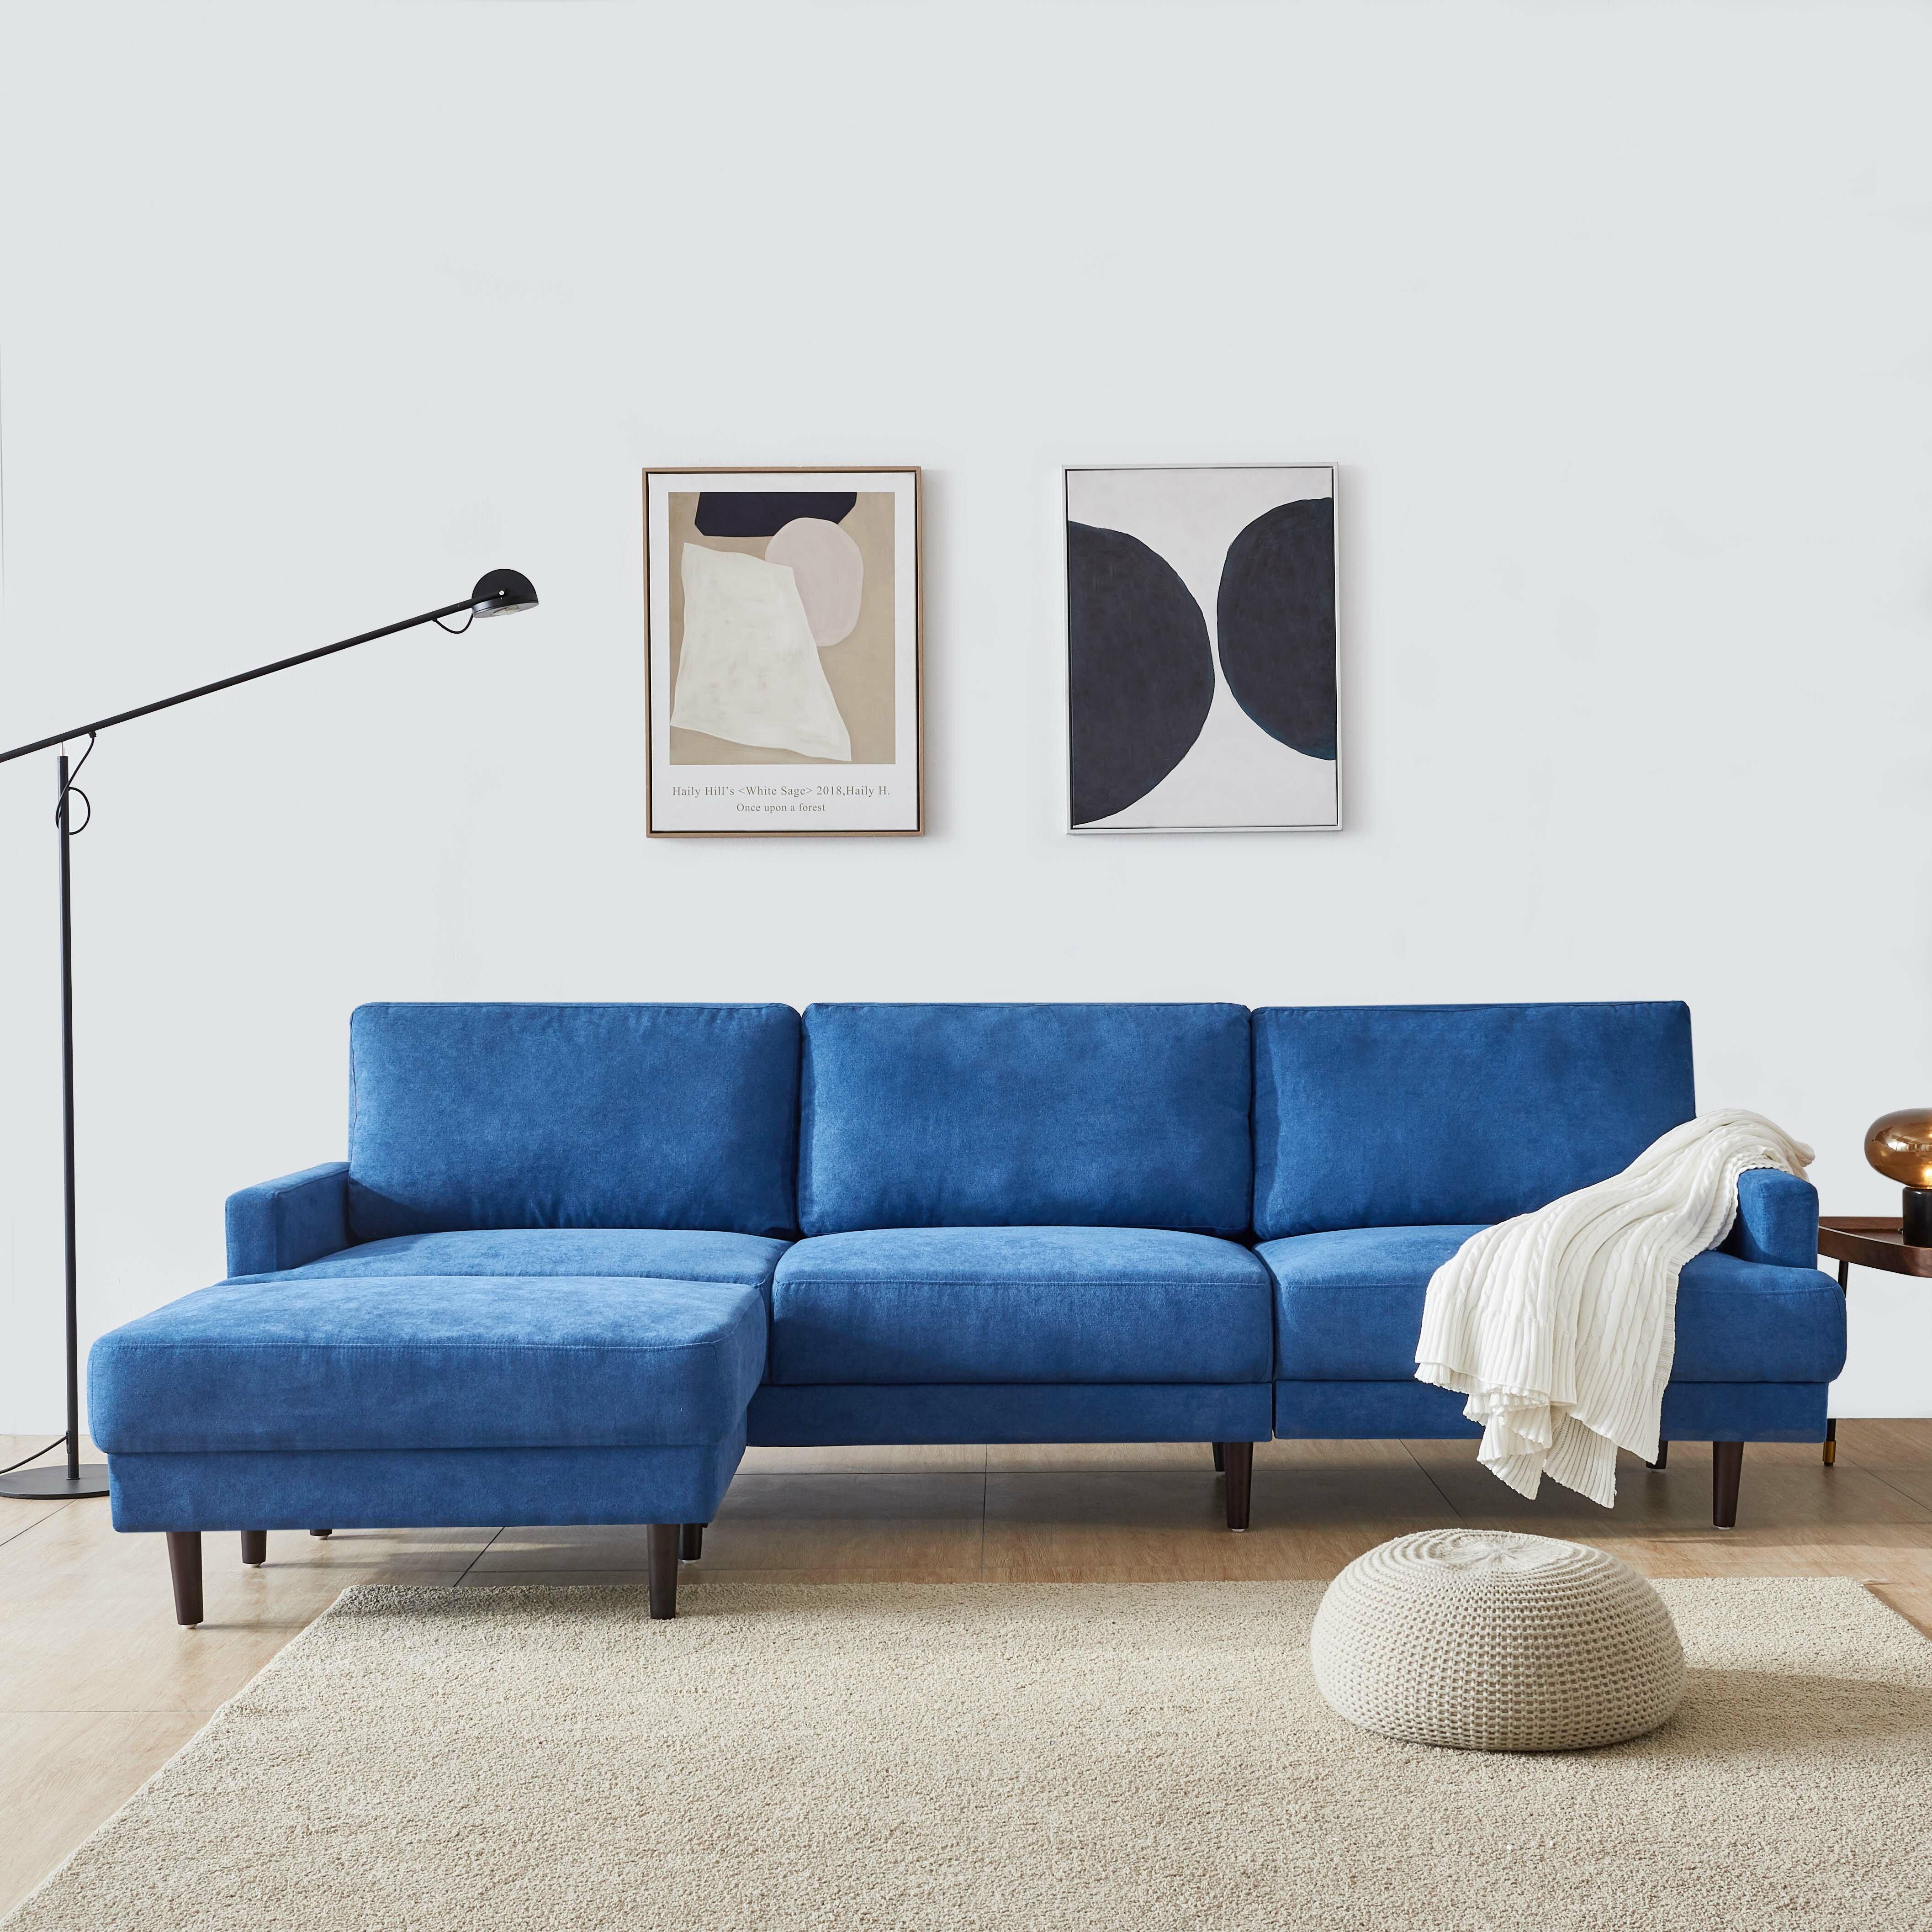 Corrigan Studio Harney 104 Reversible Modular Sofa Chaise With Ottoman Wayfair